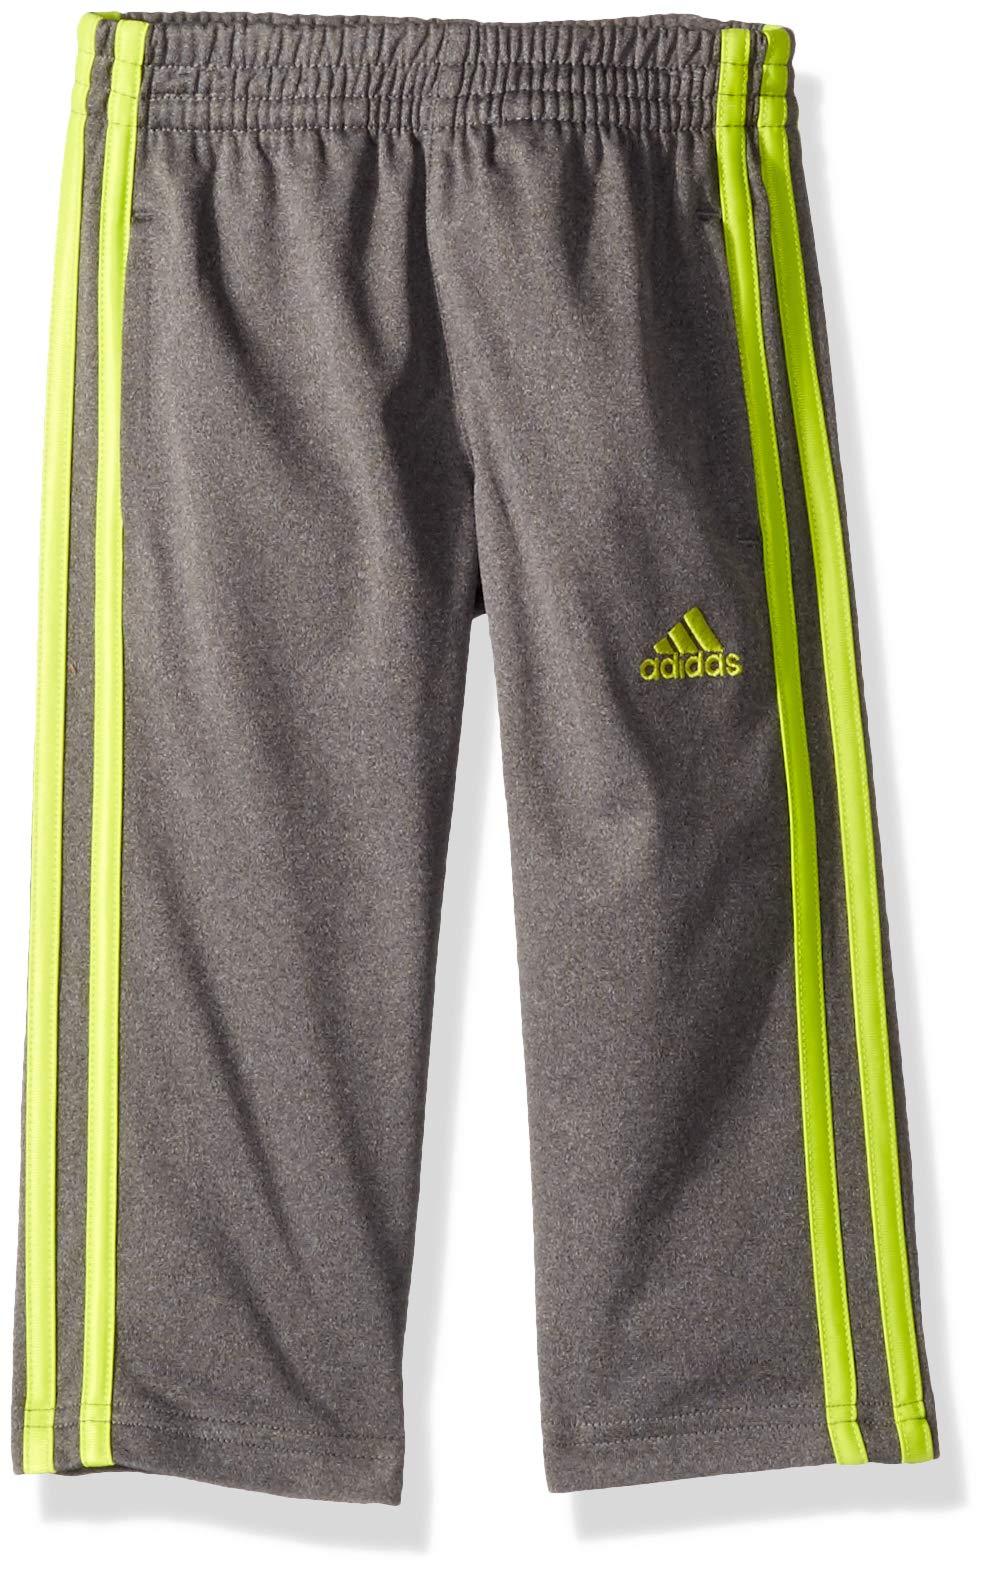 adidas Boys' Little Tricot Pant, Dk Grey, 2T